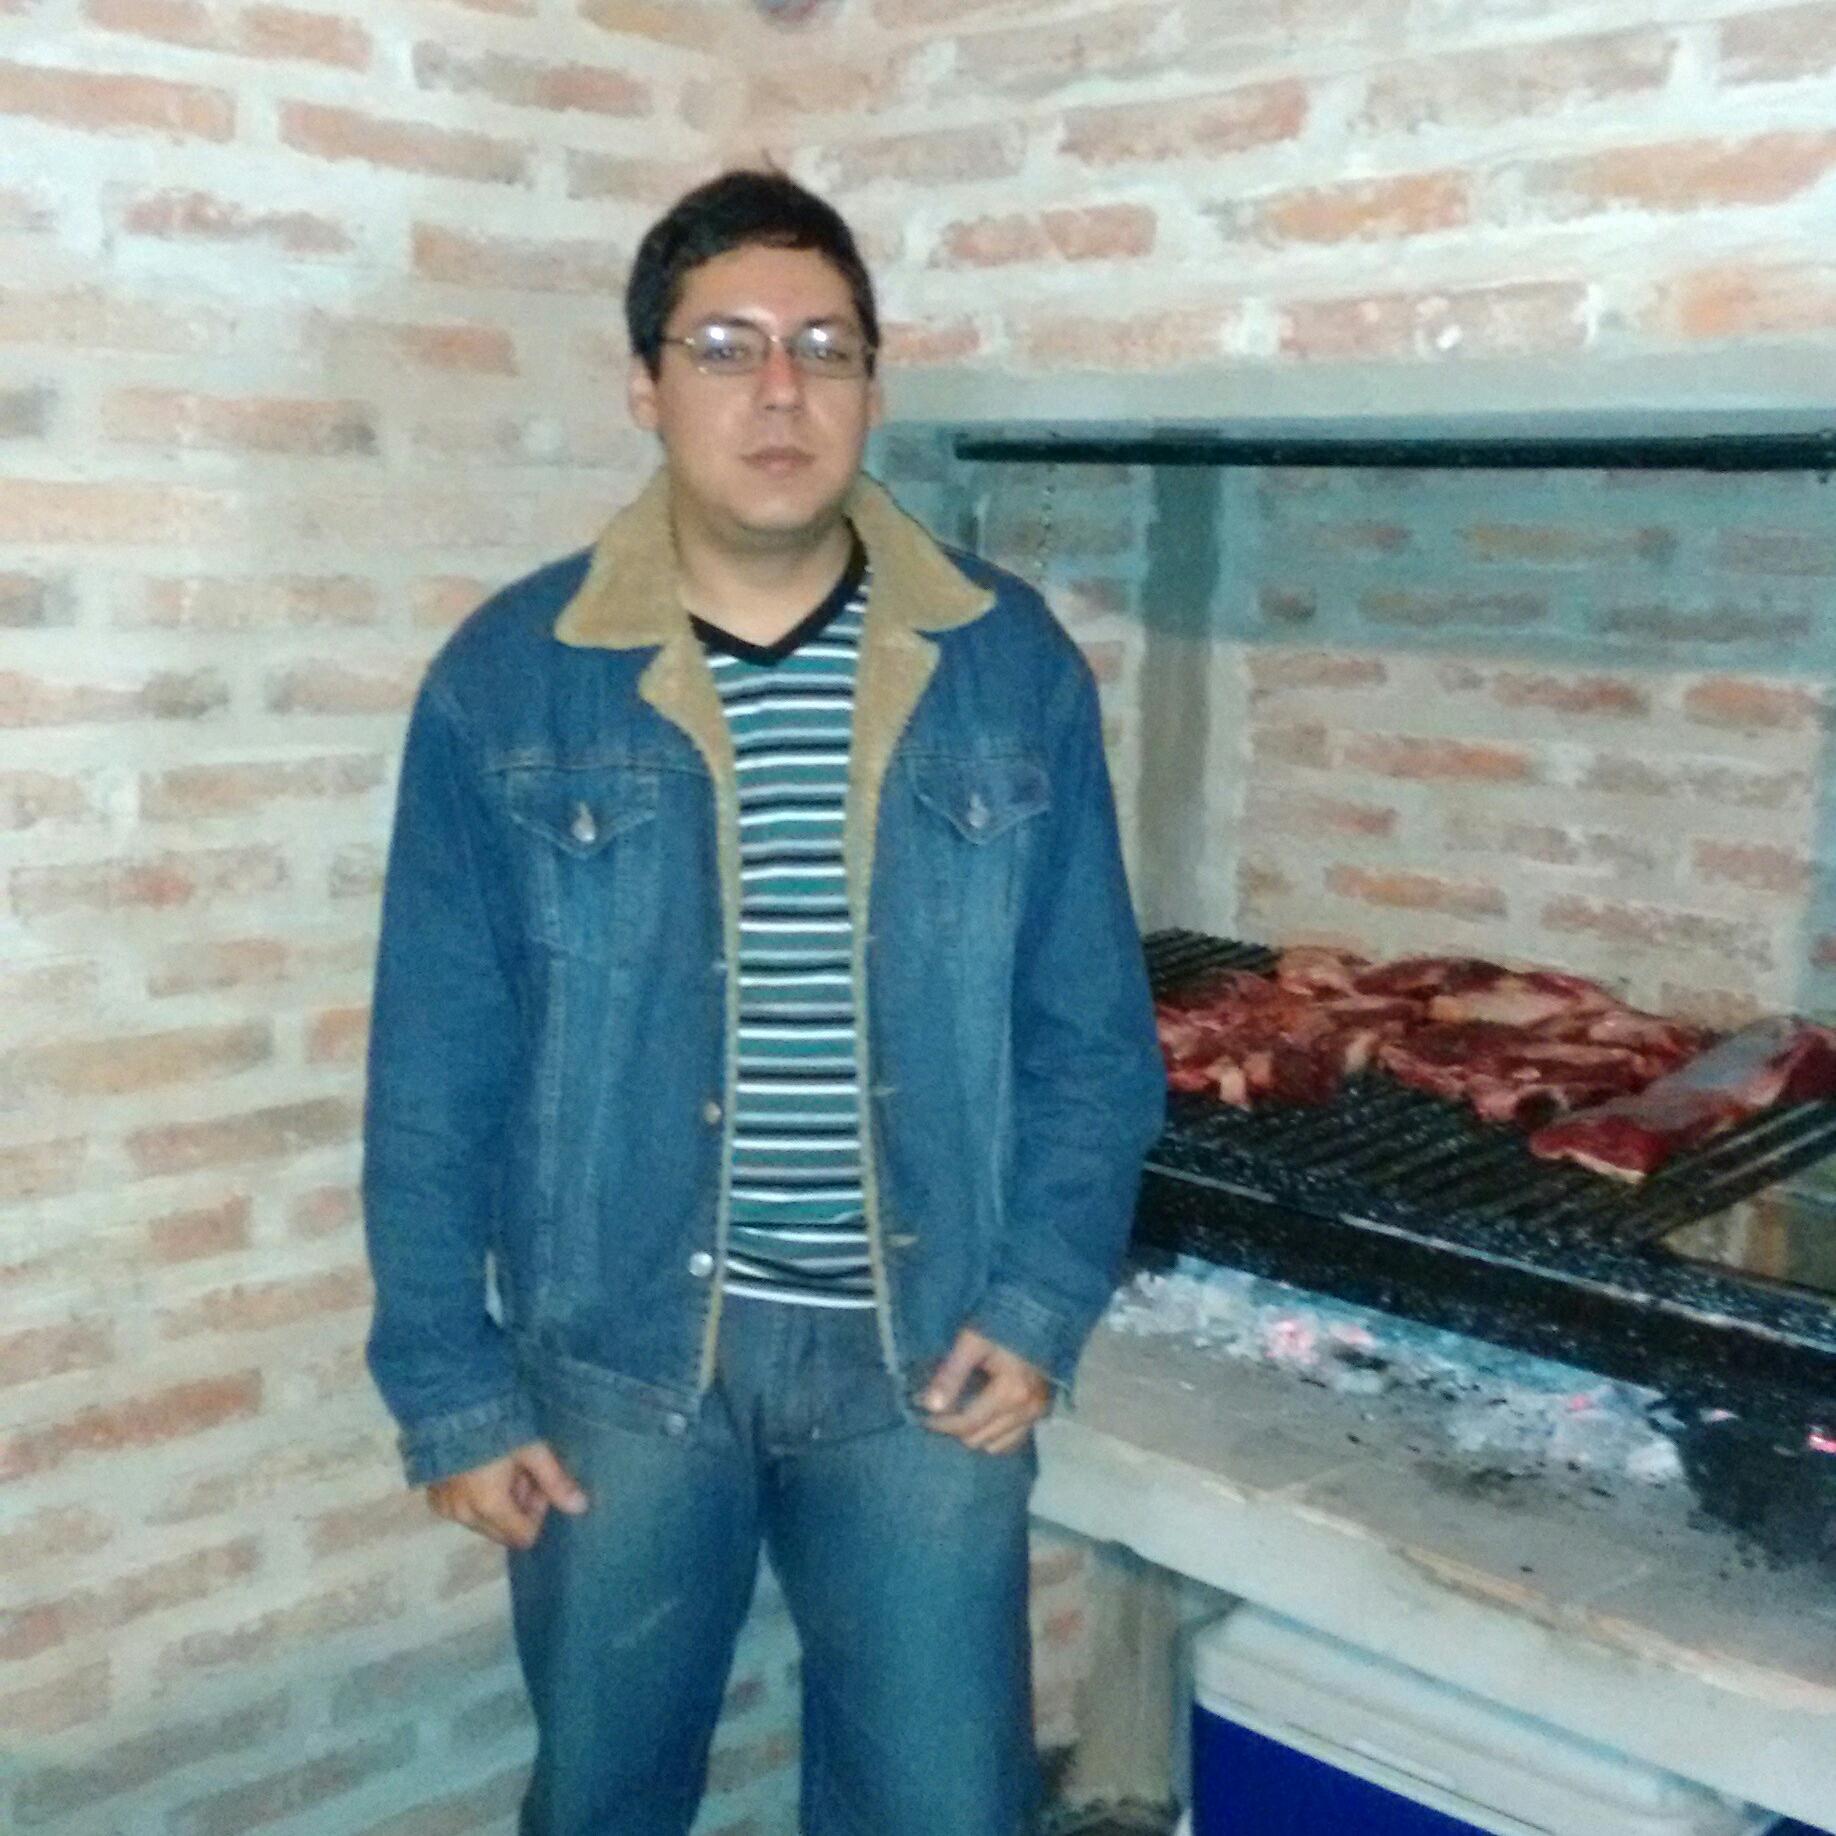 Carlosht83